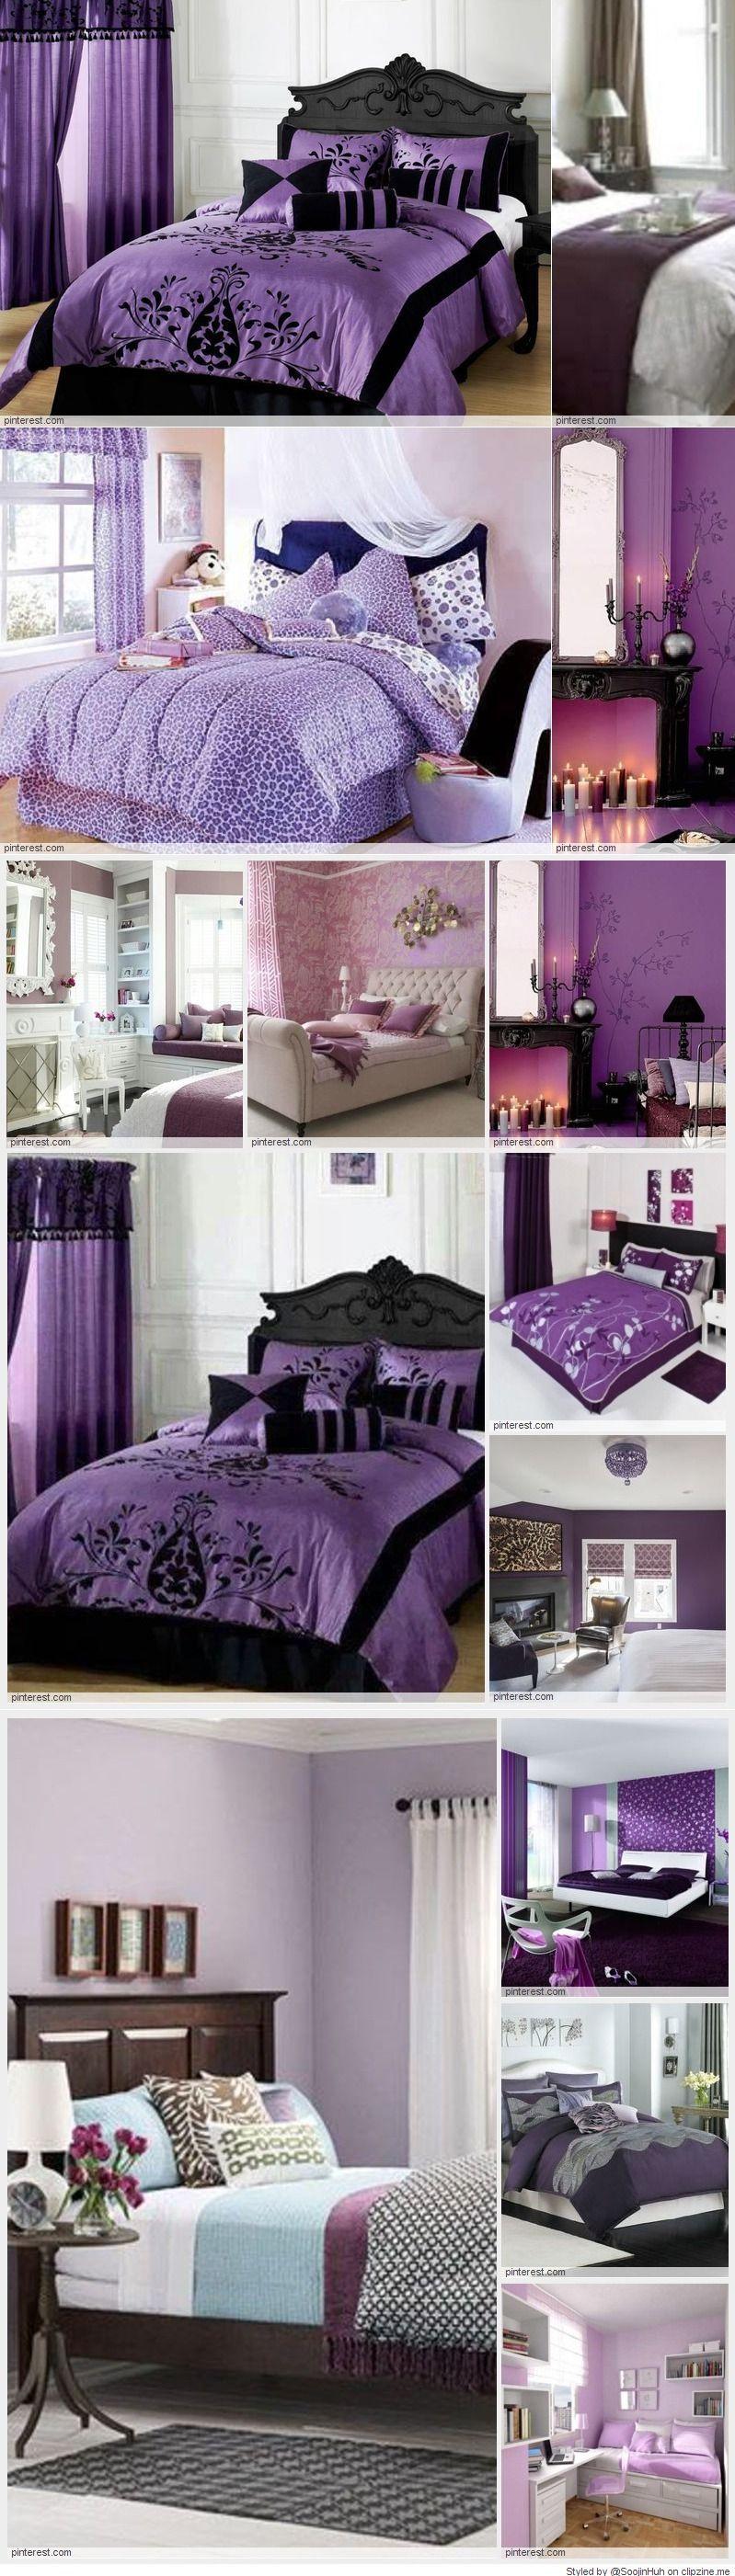 Purple Bedroom Decorating Ideas Bedroom Redo Ideas